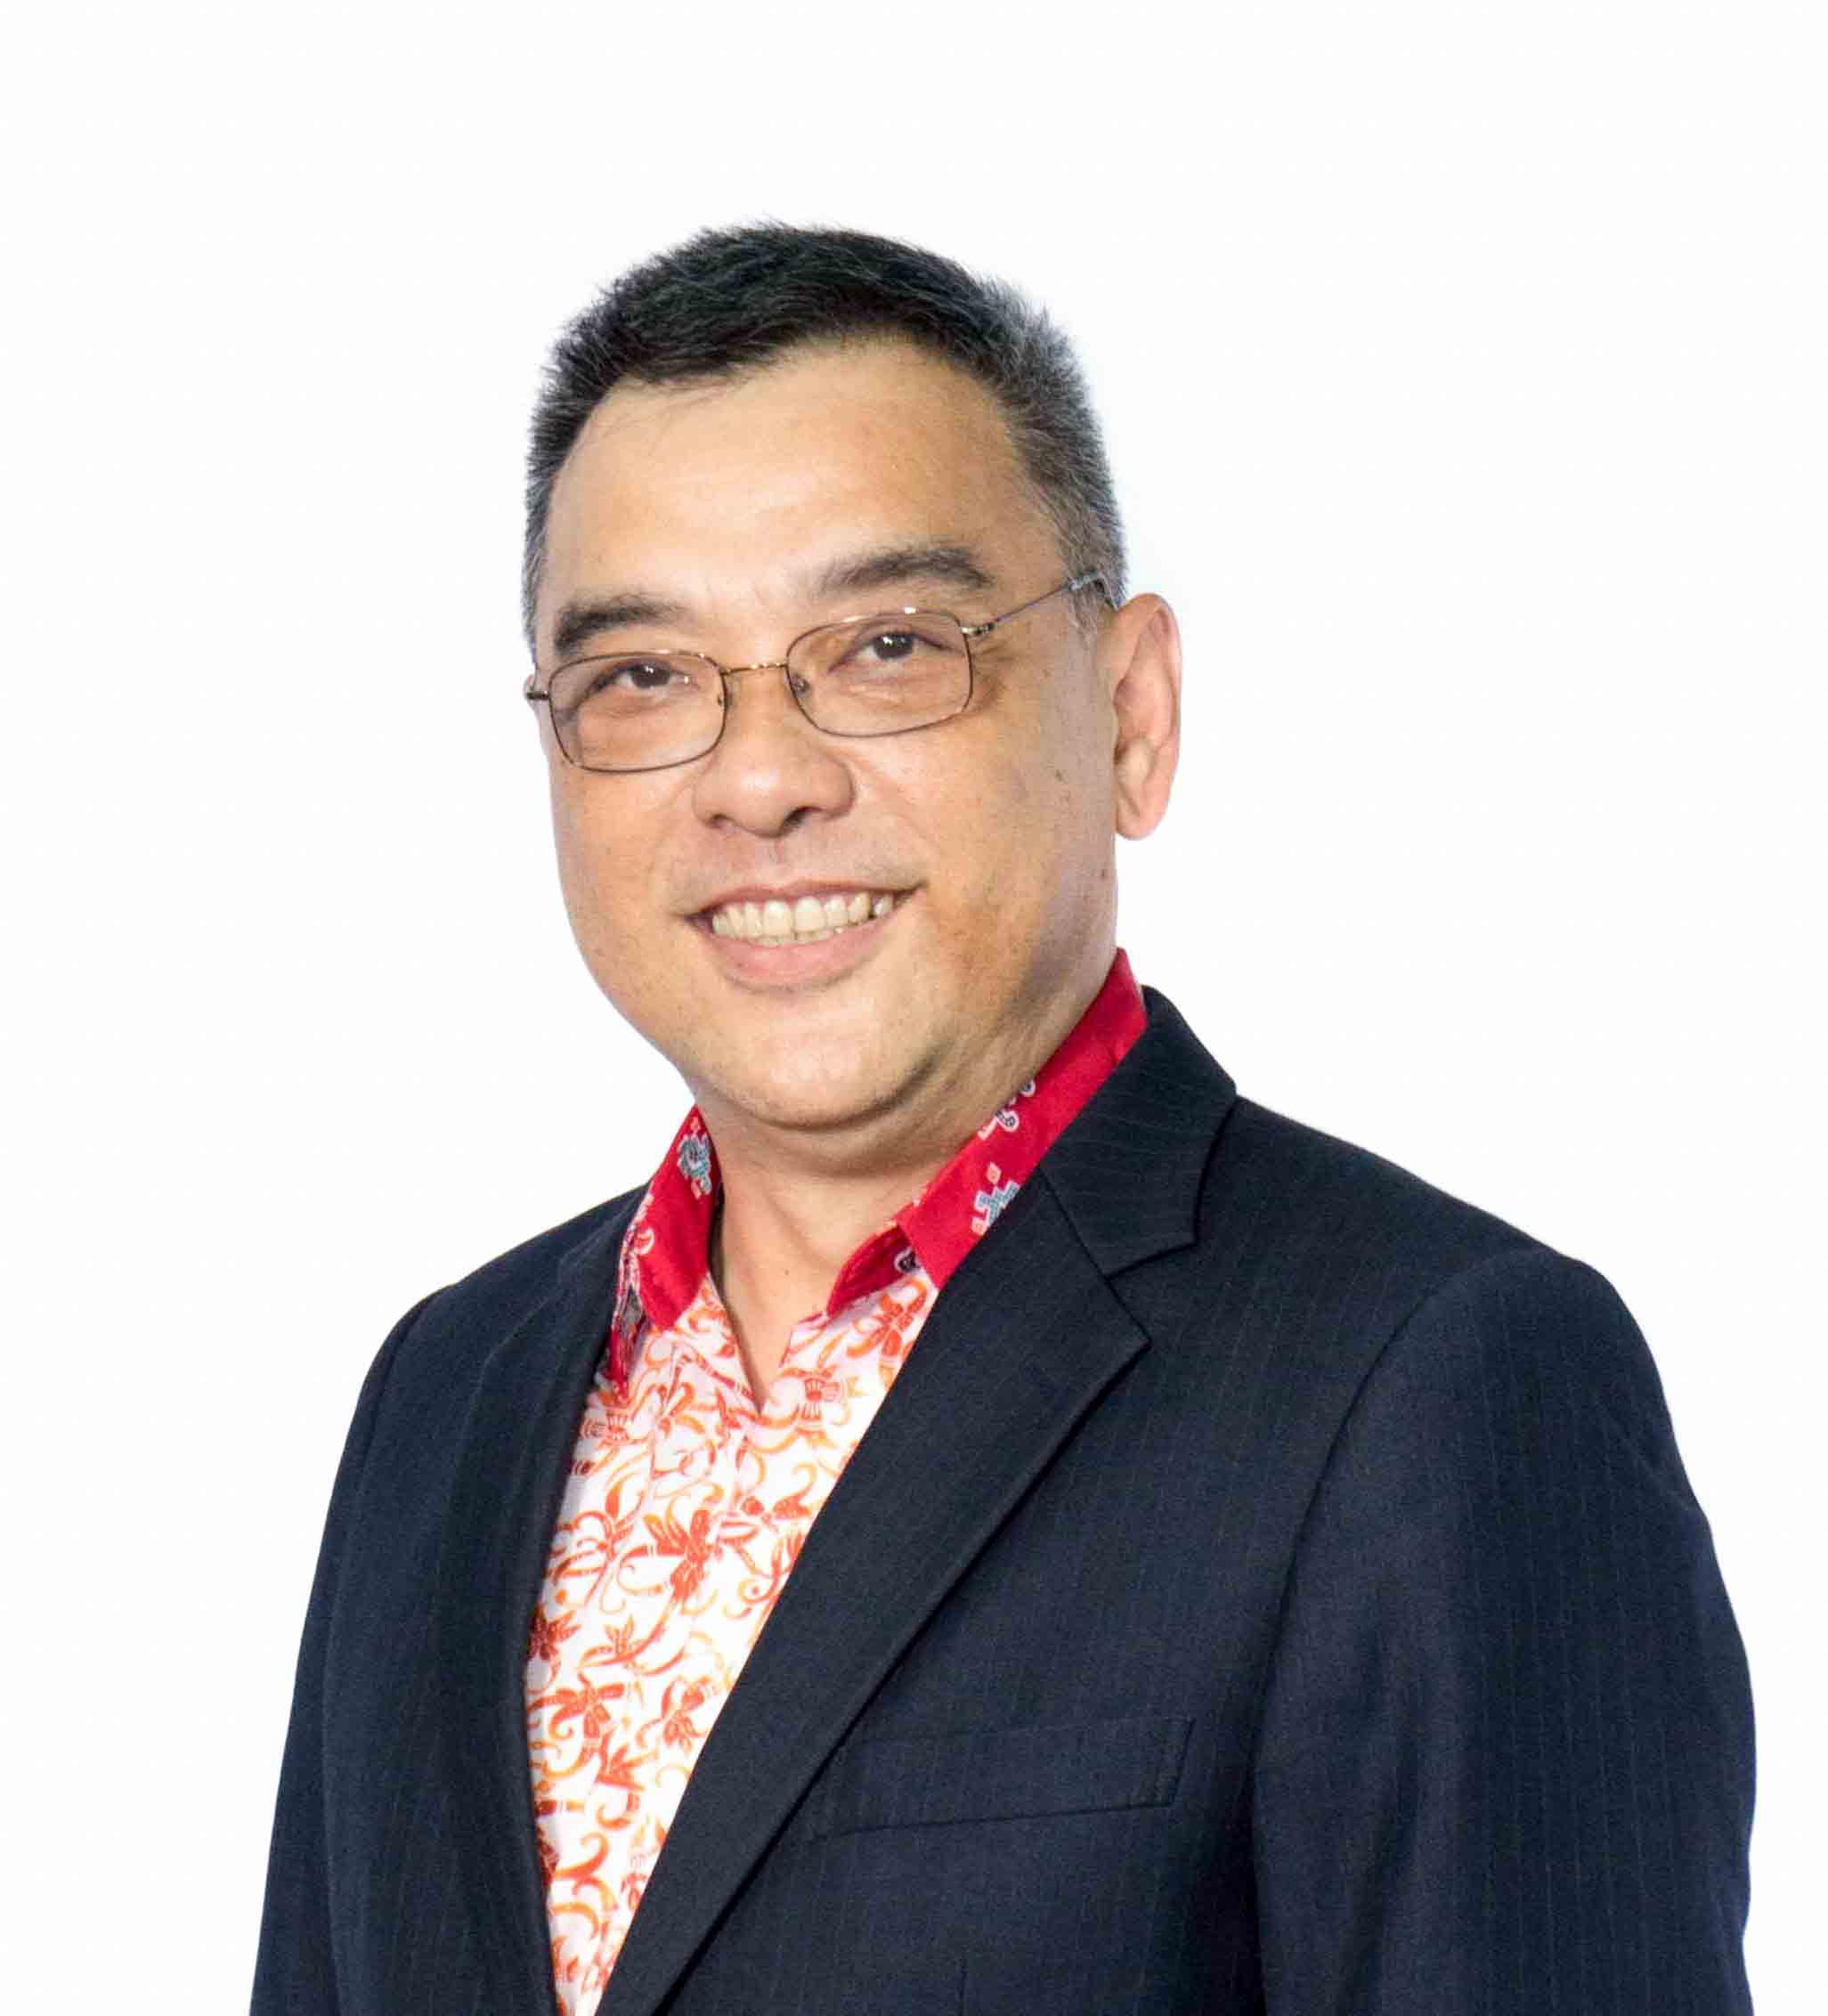 Dr. Chong Siaw Fung